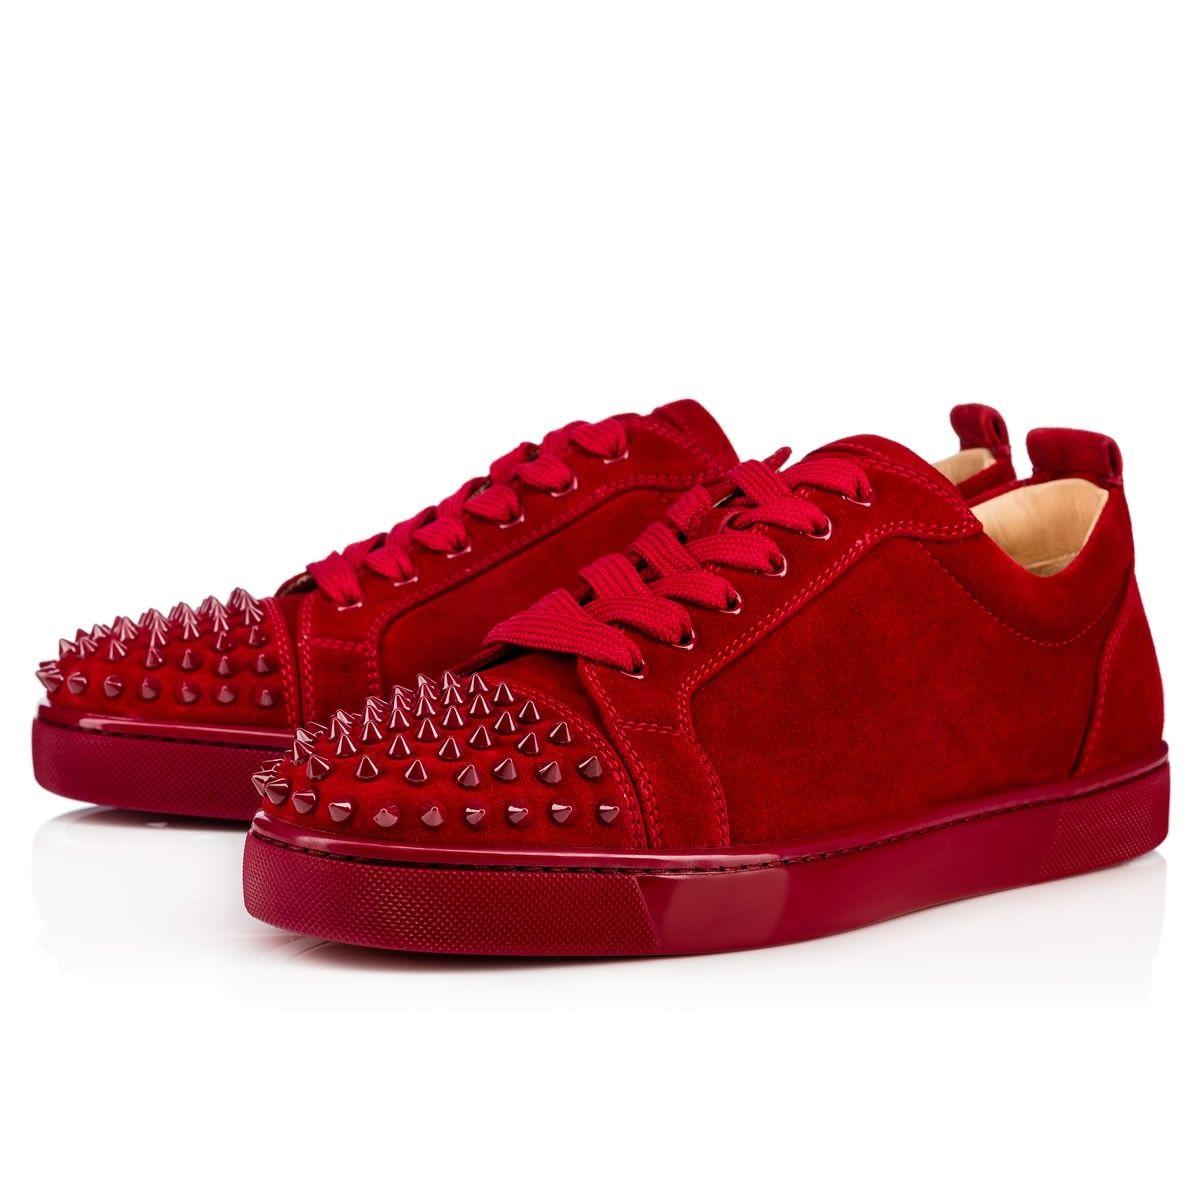 Louis Junior Spikes Men\u0027s Flat Version Silver Lame Sirene - Men Shoes -  Christian Louboutin